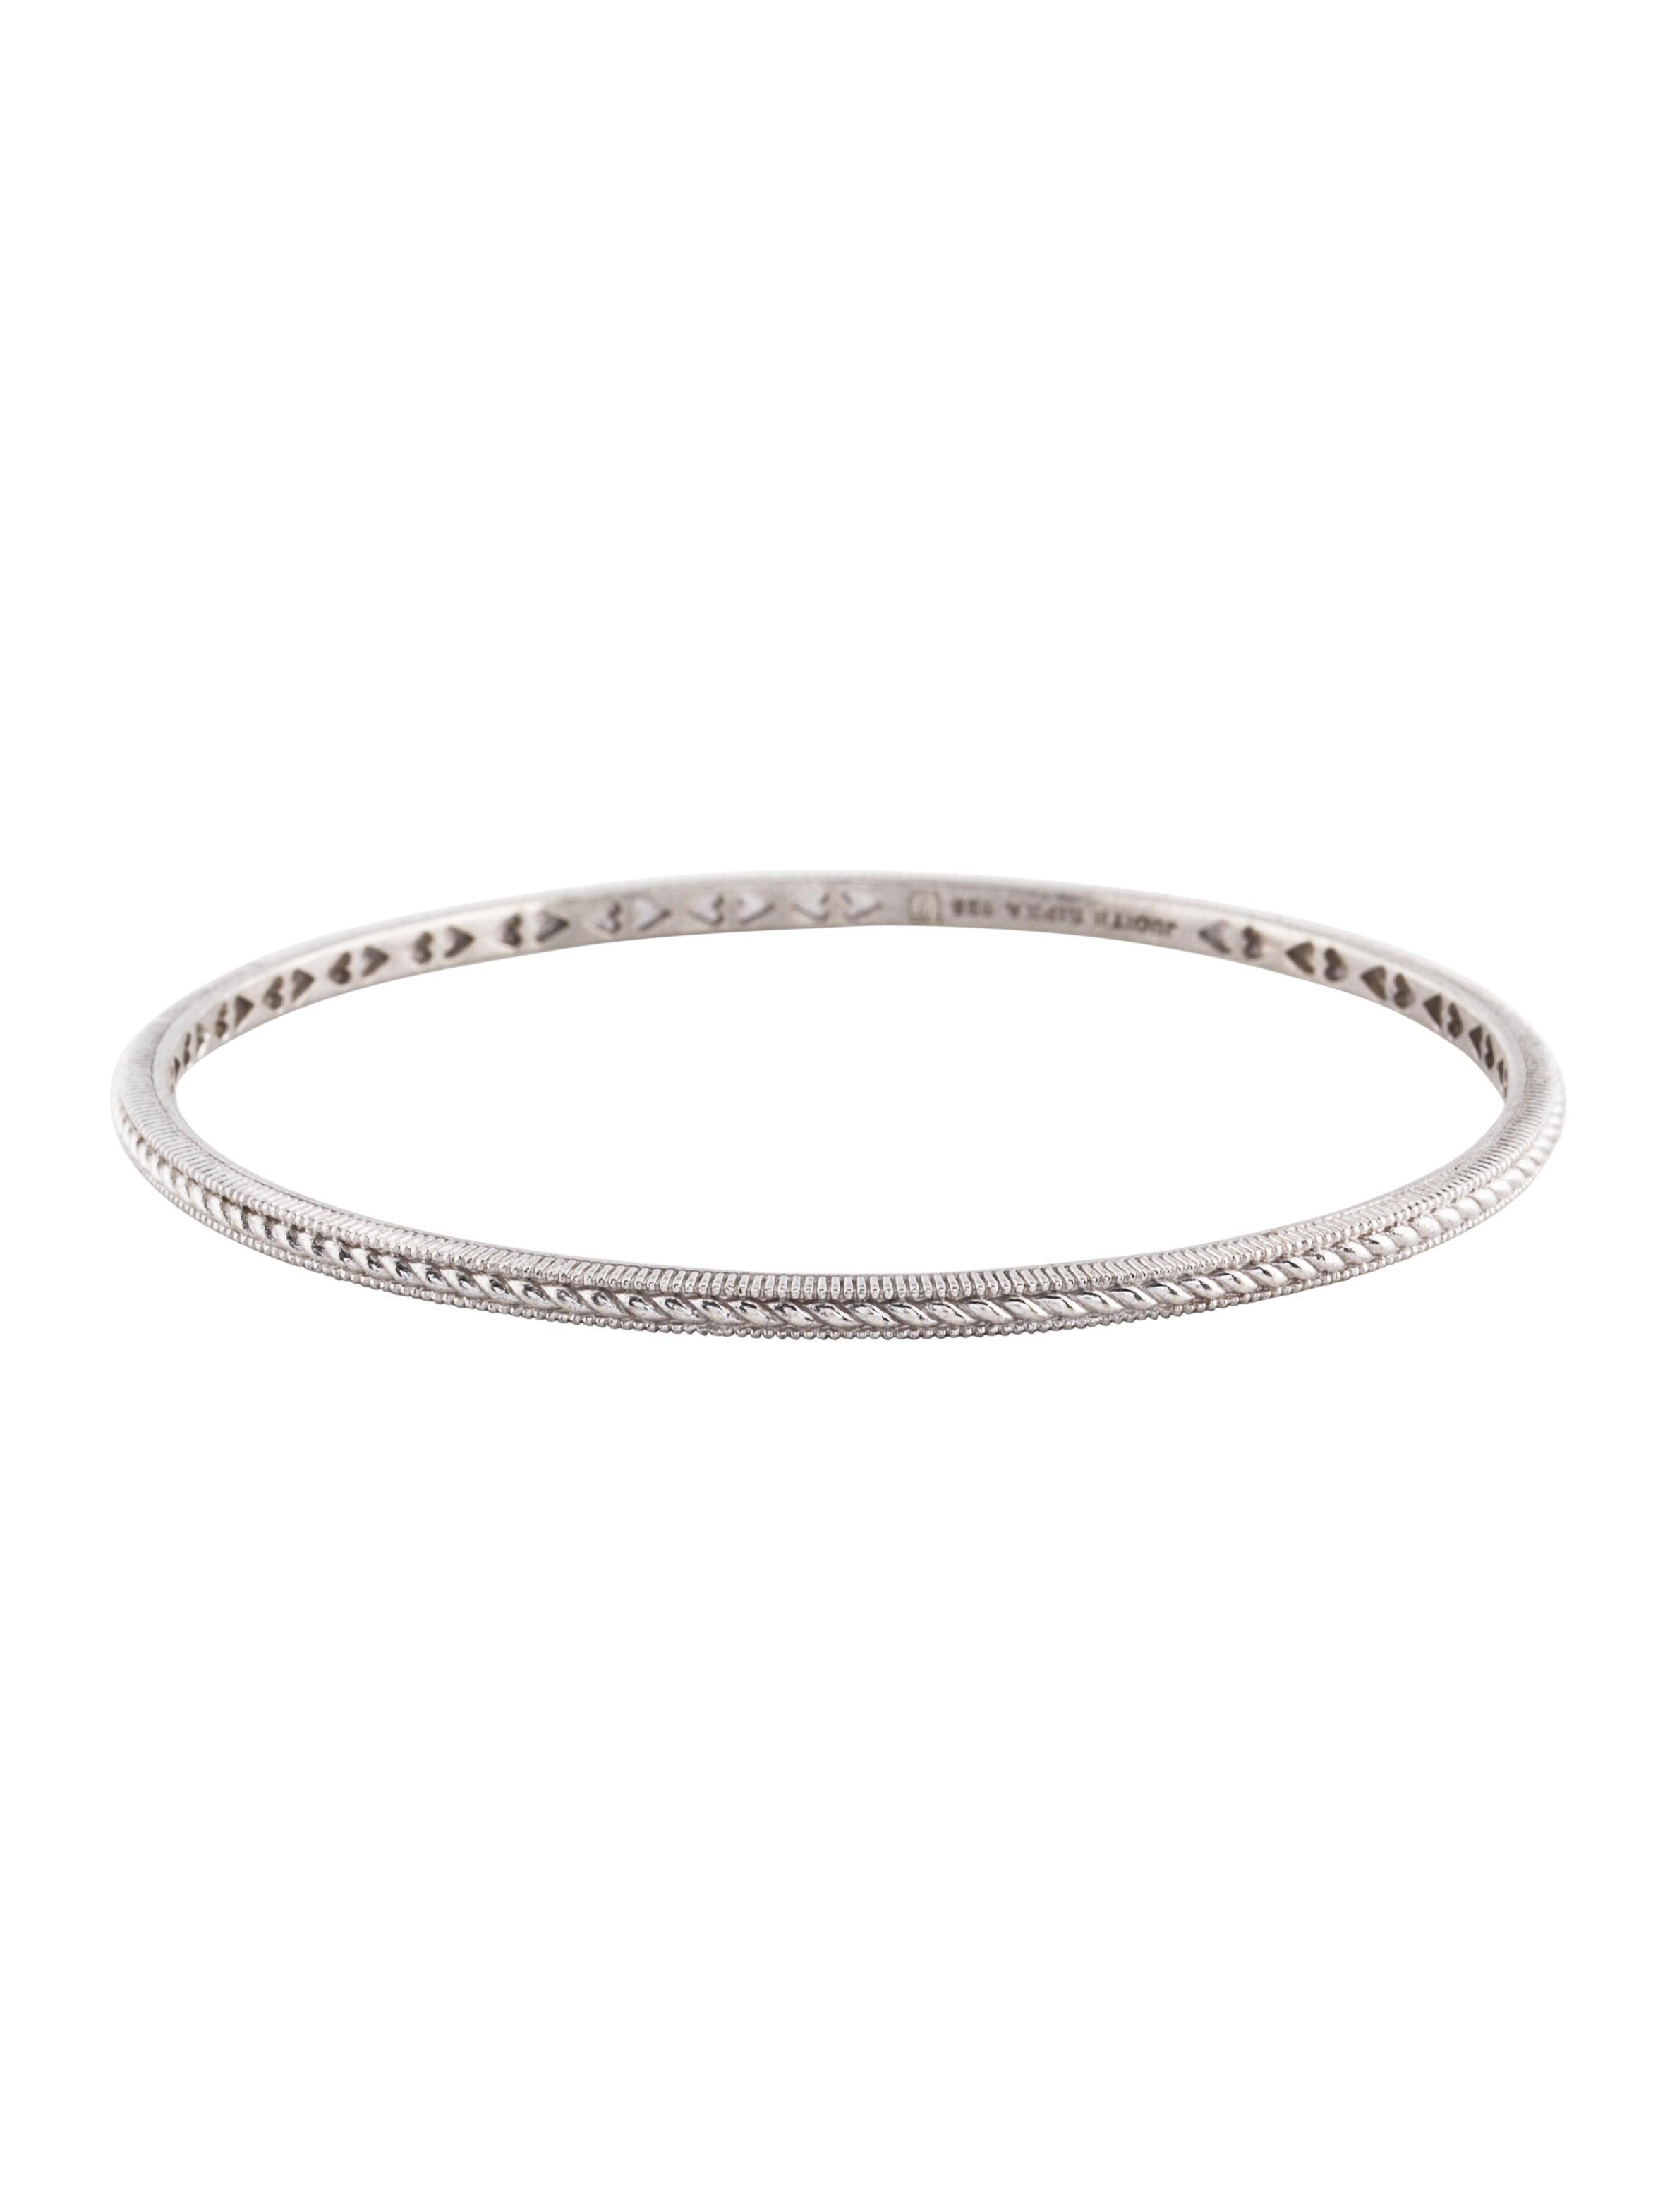 Jewelry Bracelets Judith Ripka Thin Textured Bangle